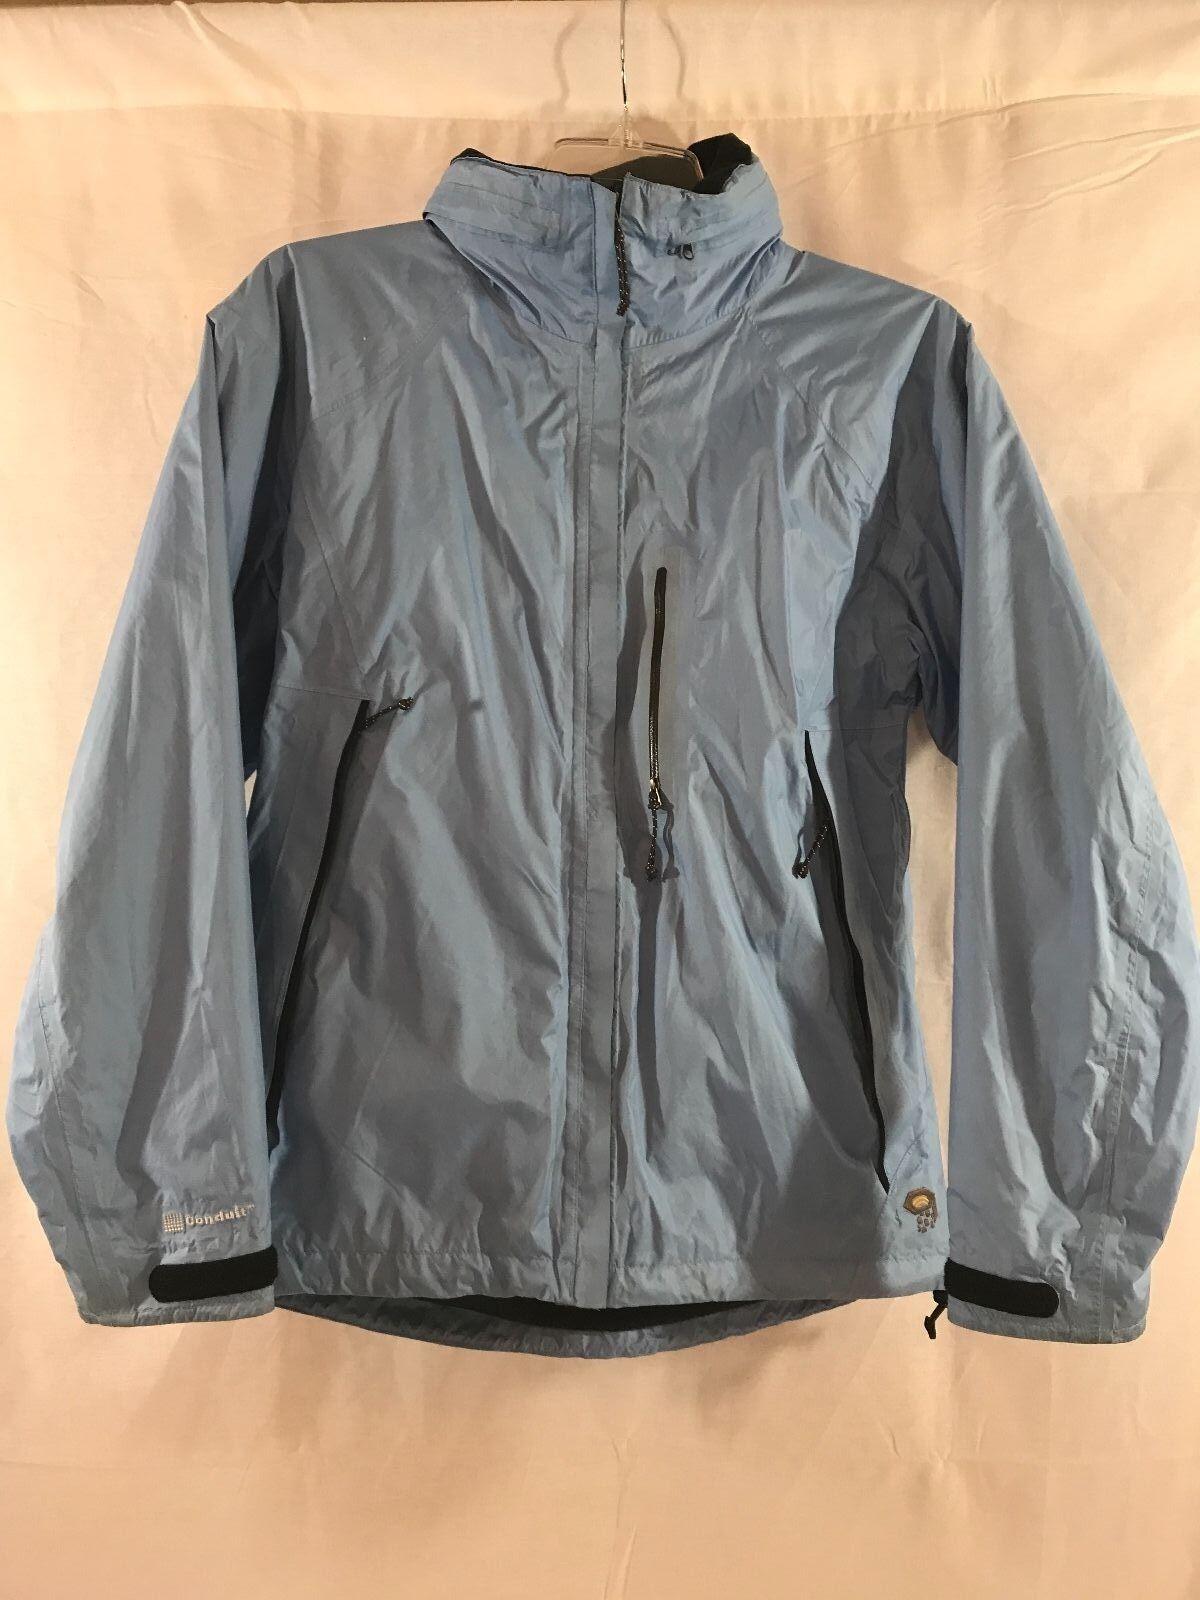 VGUC Mountain Hardwear Conduit women's jacket sz 10 Tall Light Blue